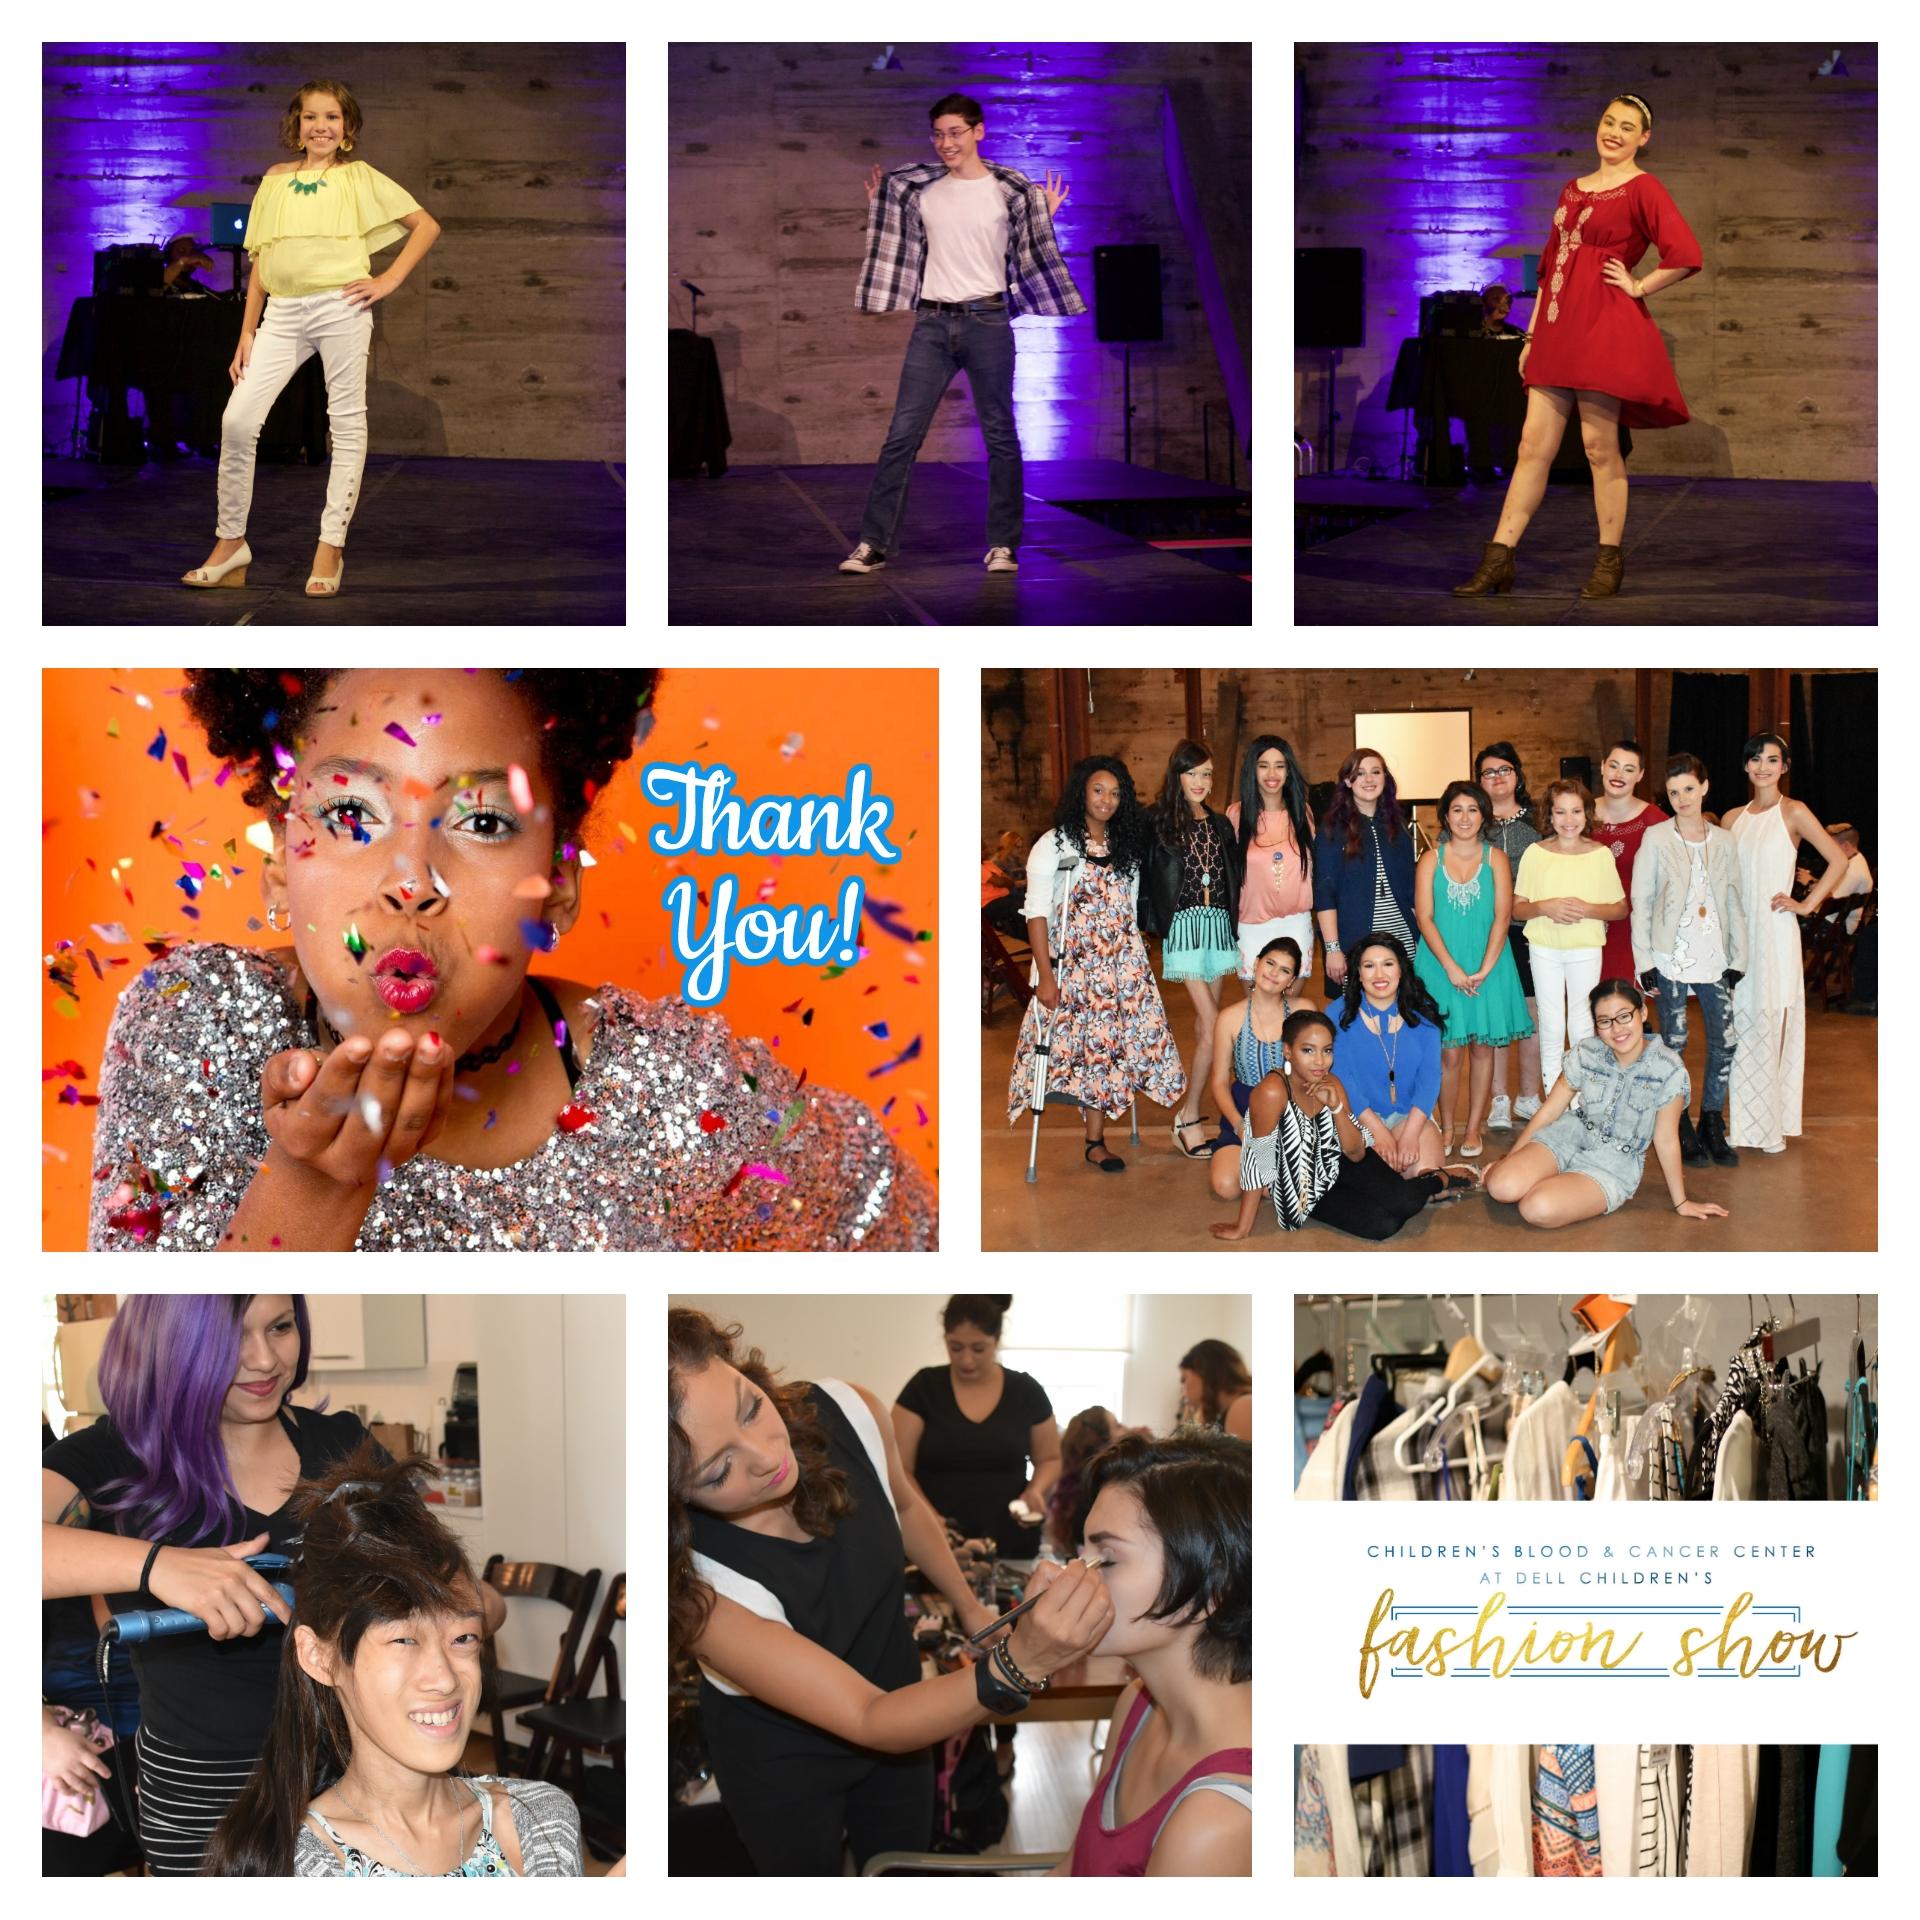 CBCC Fashion Show Sponsors 2017